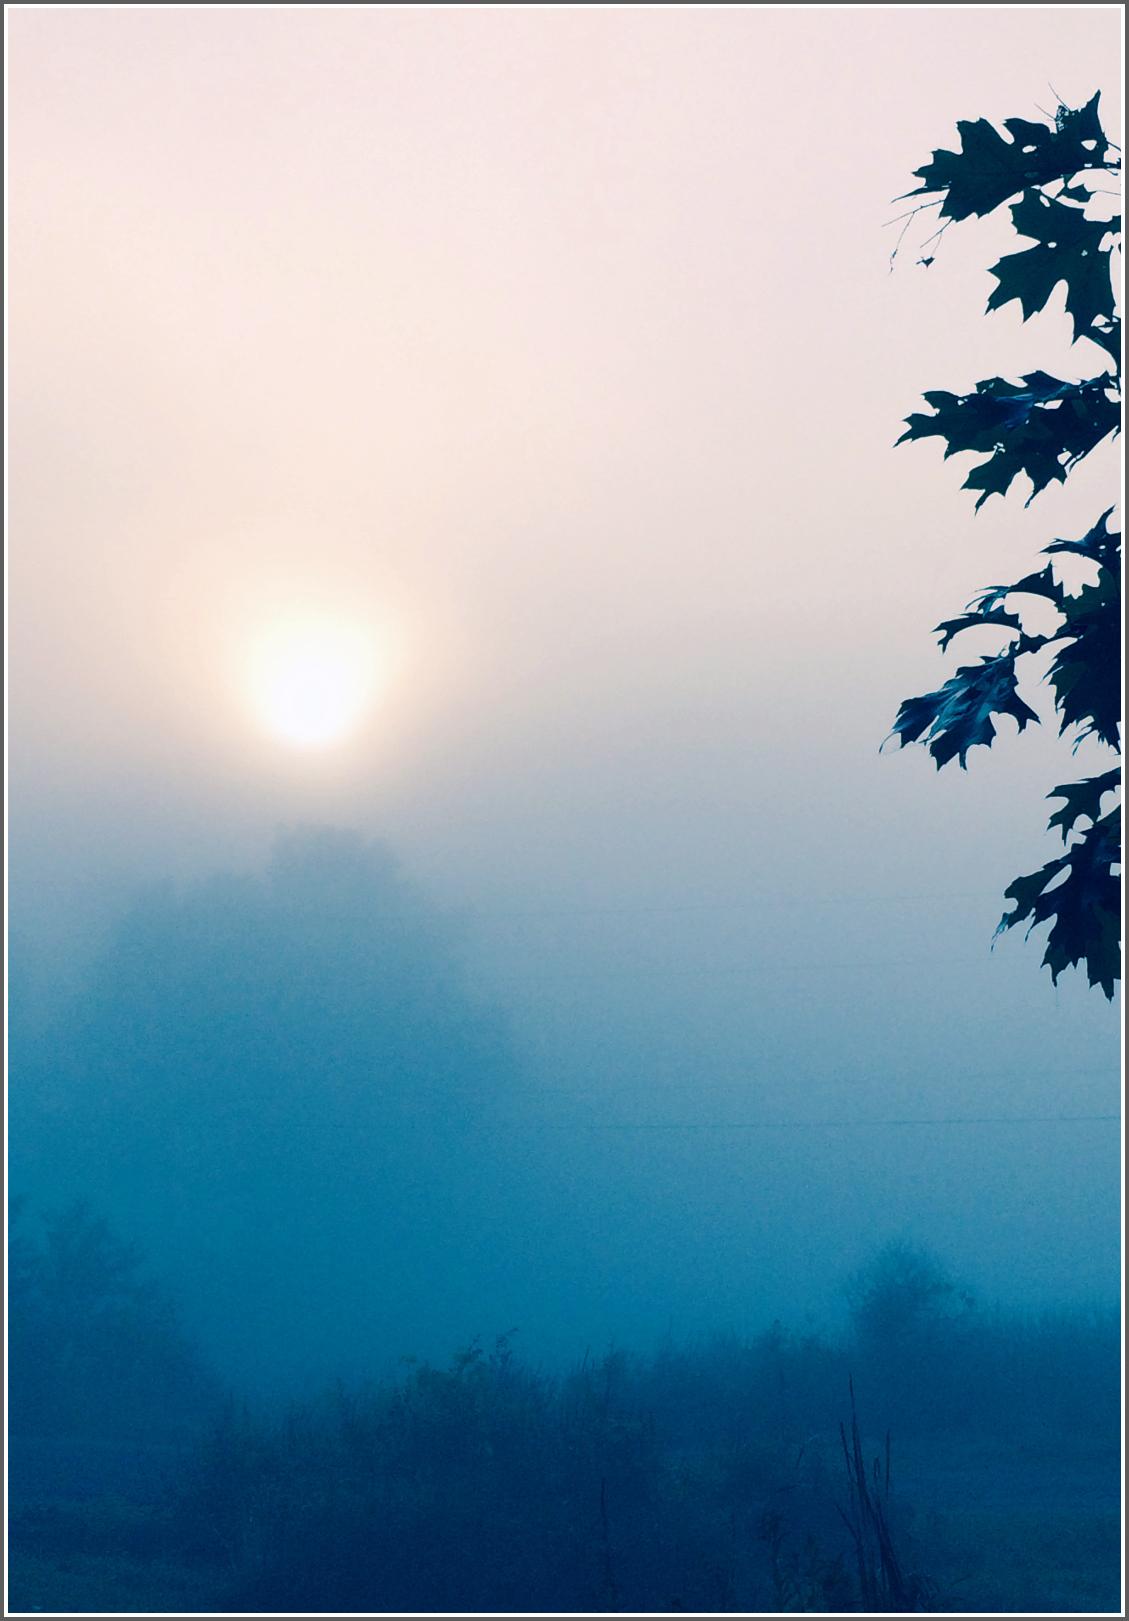 Sunrise Thru The Mist by Dena T BrayⒸ